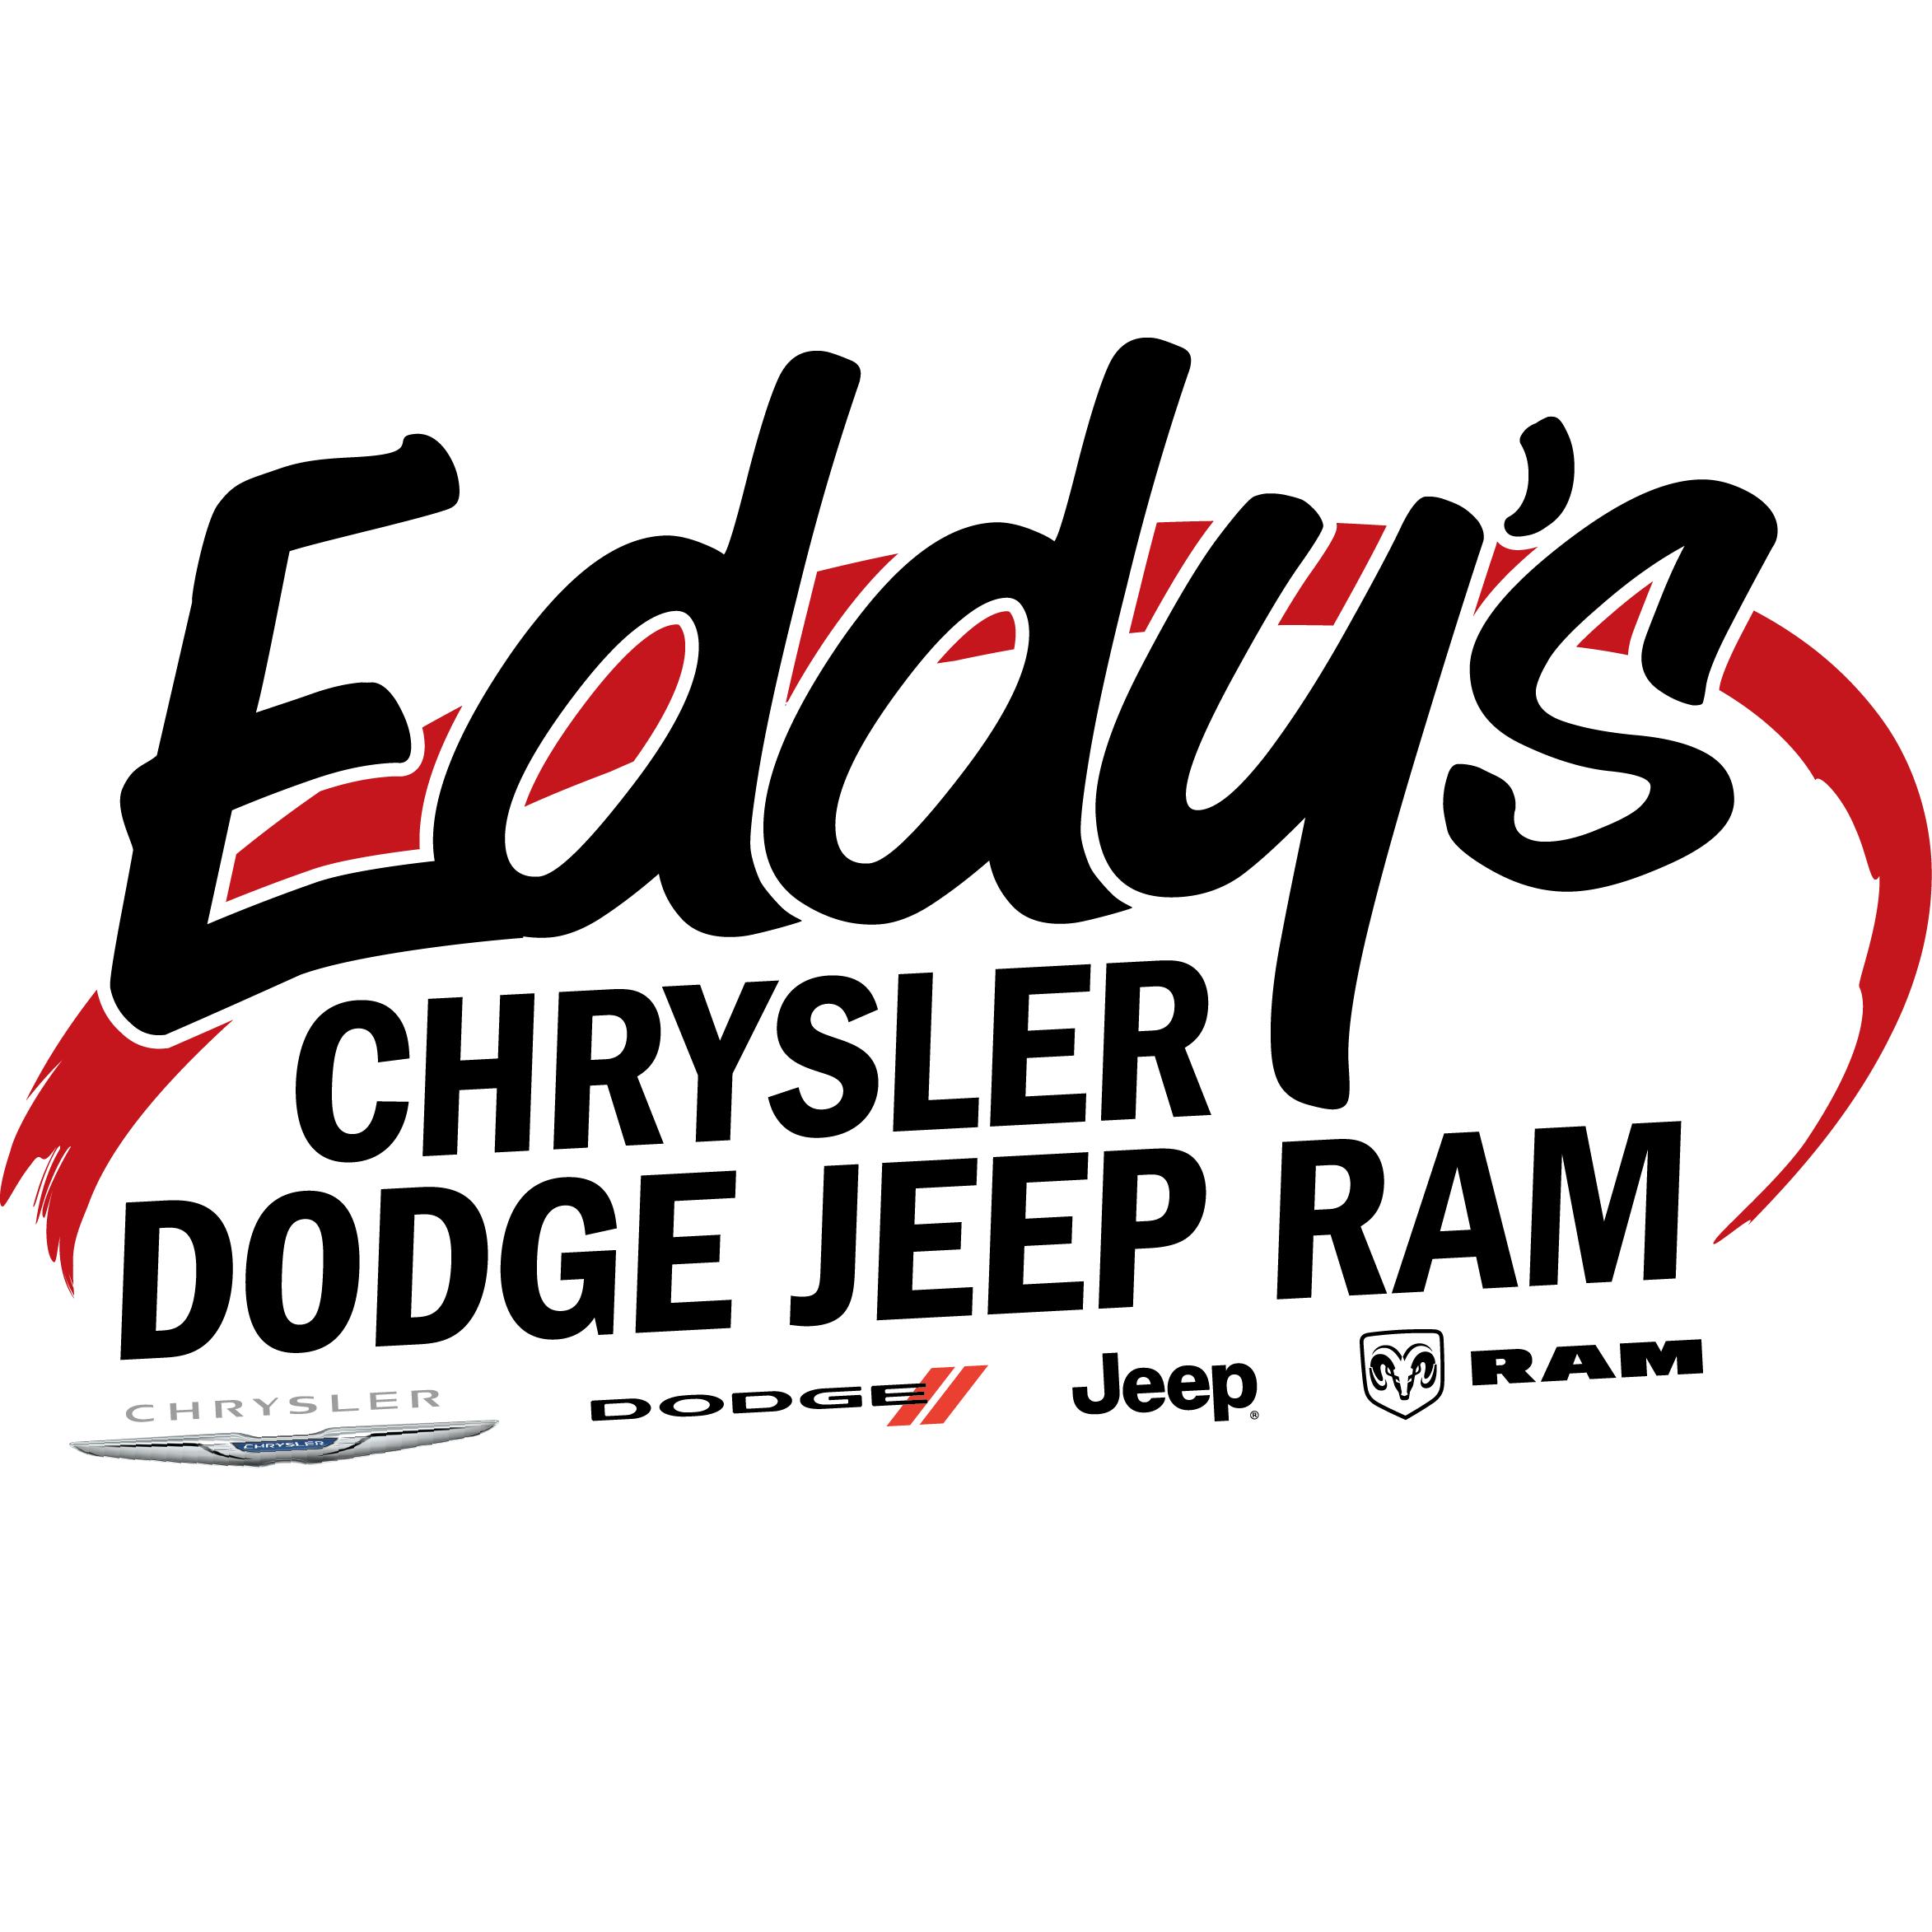 Eddy's Chrysler Dodge Jeep Ram image 0